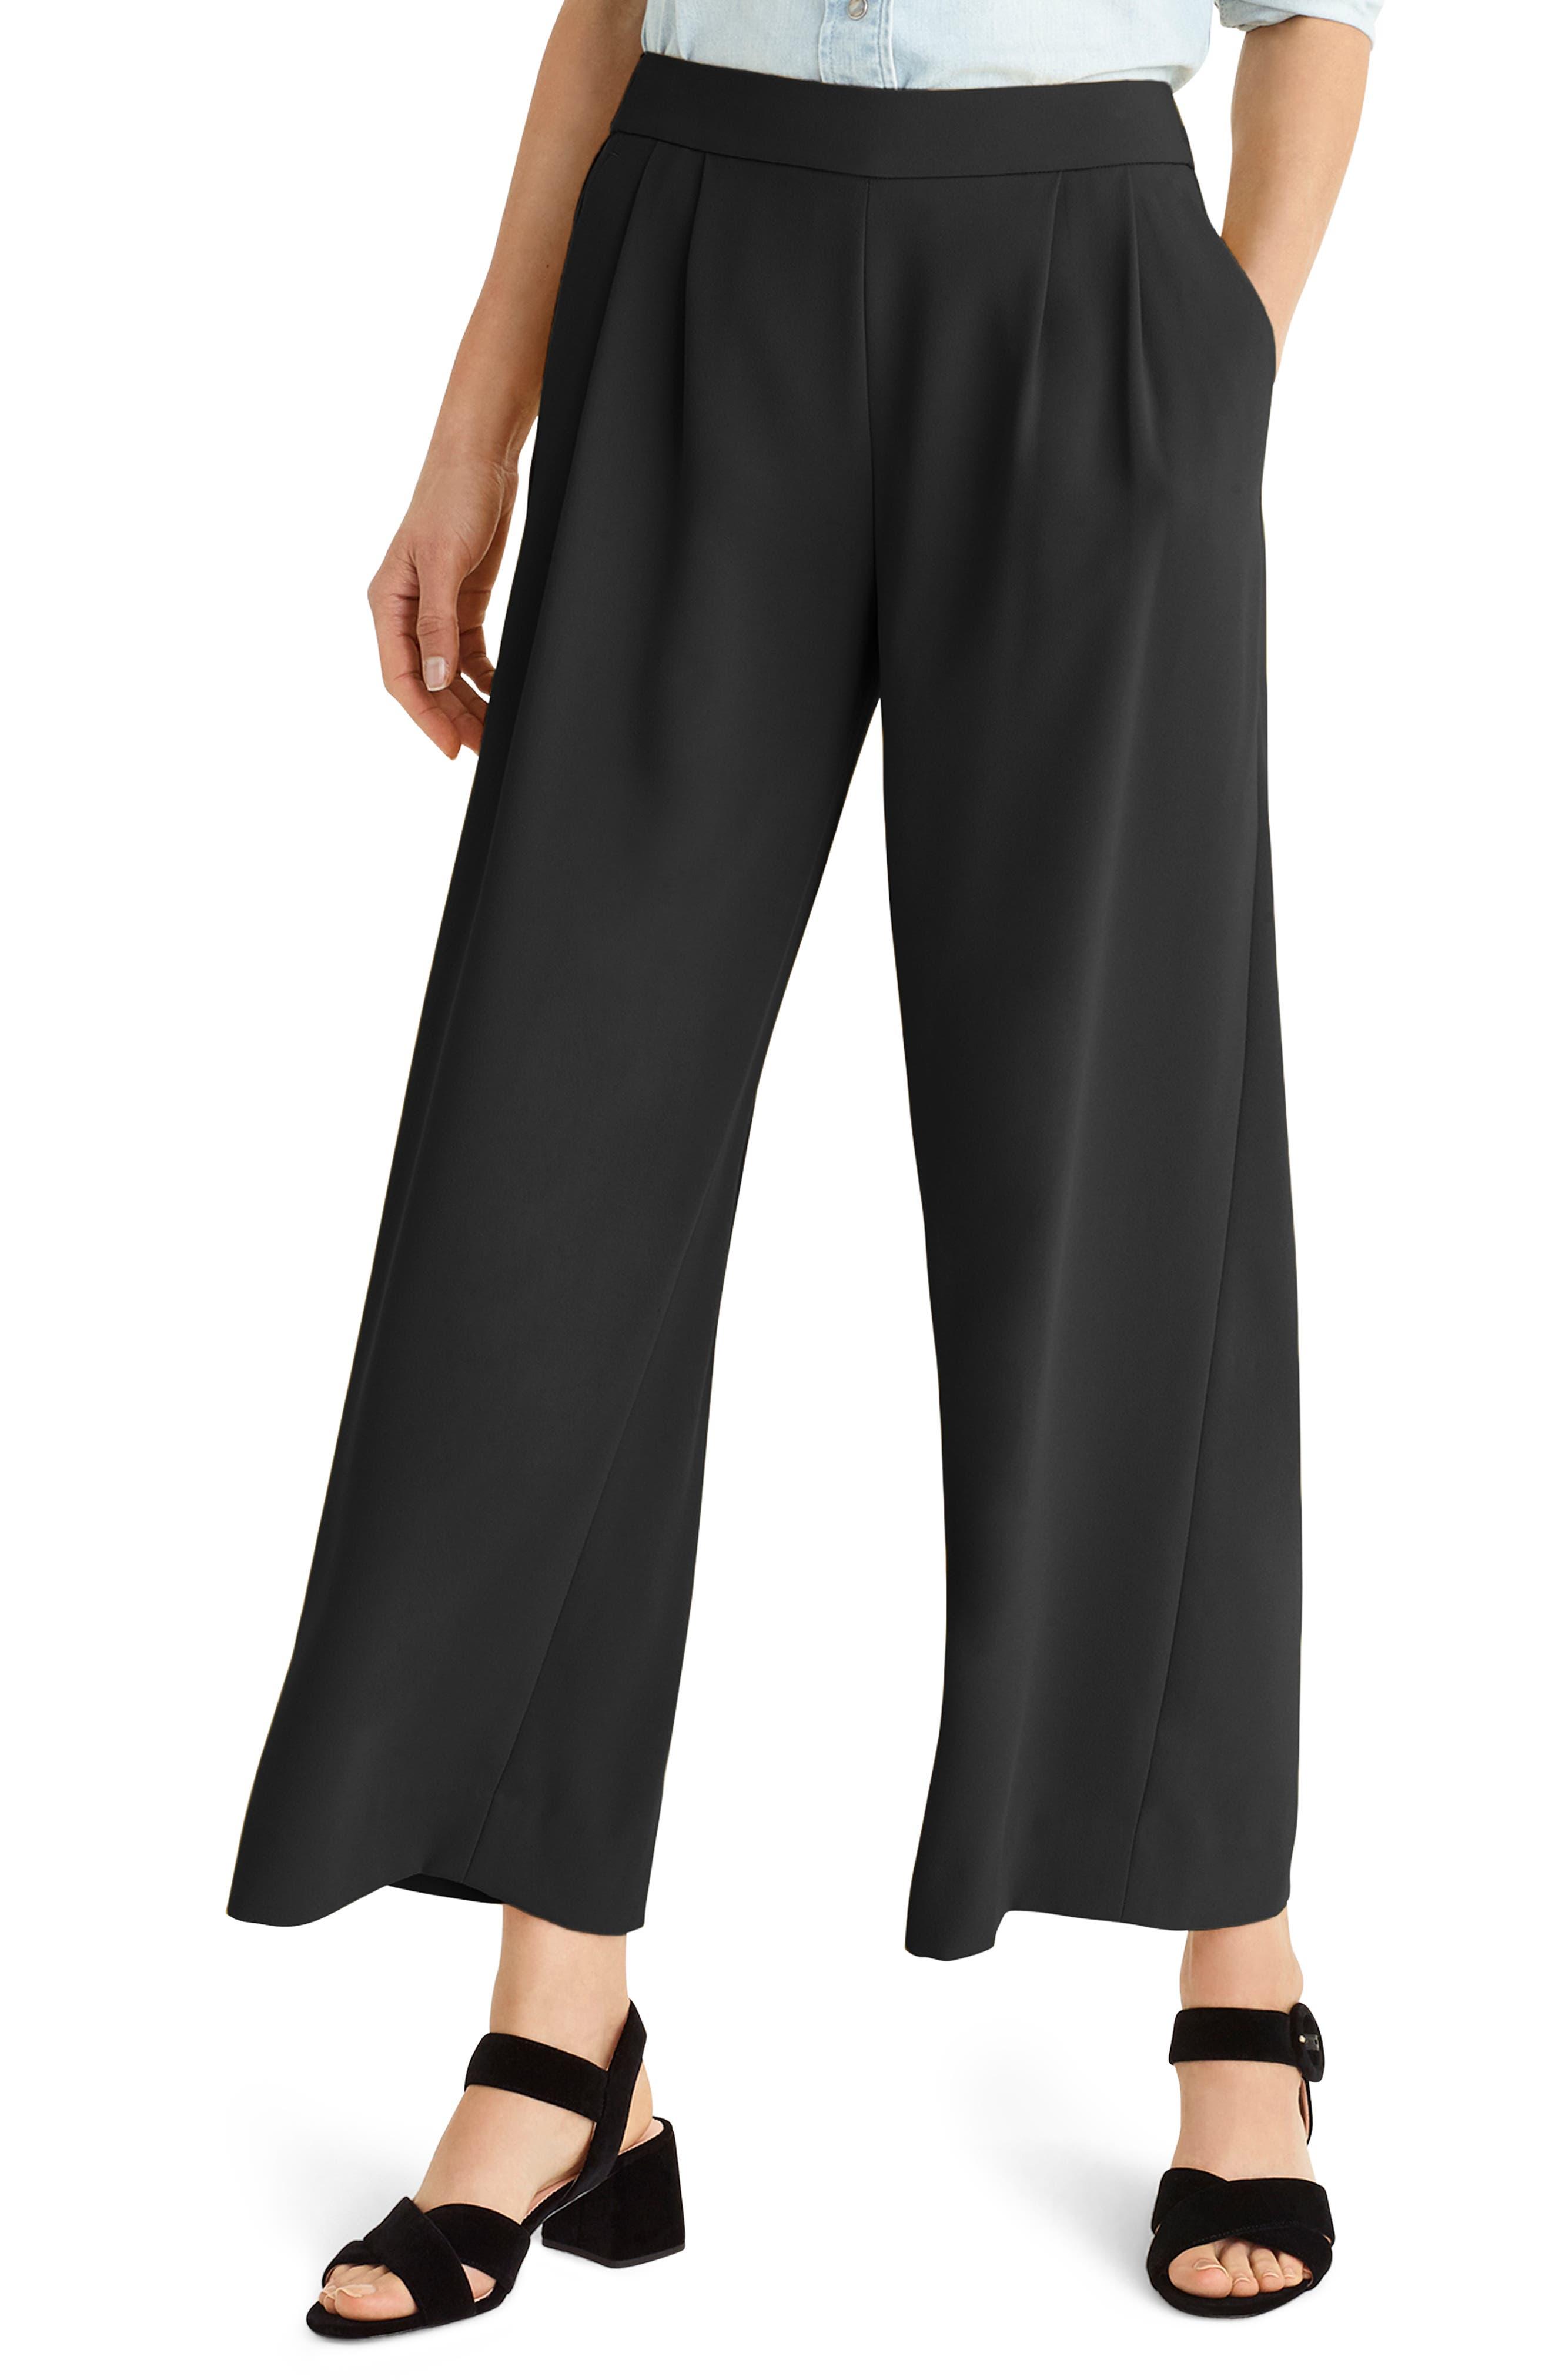 e3150e24184 Women s Travel Pants Clothing